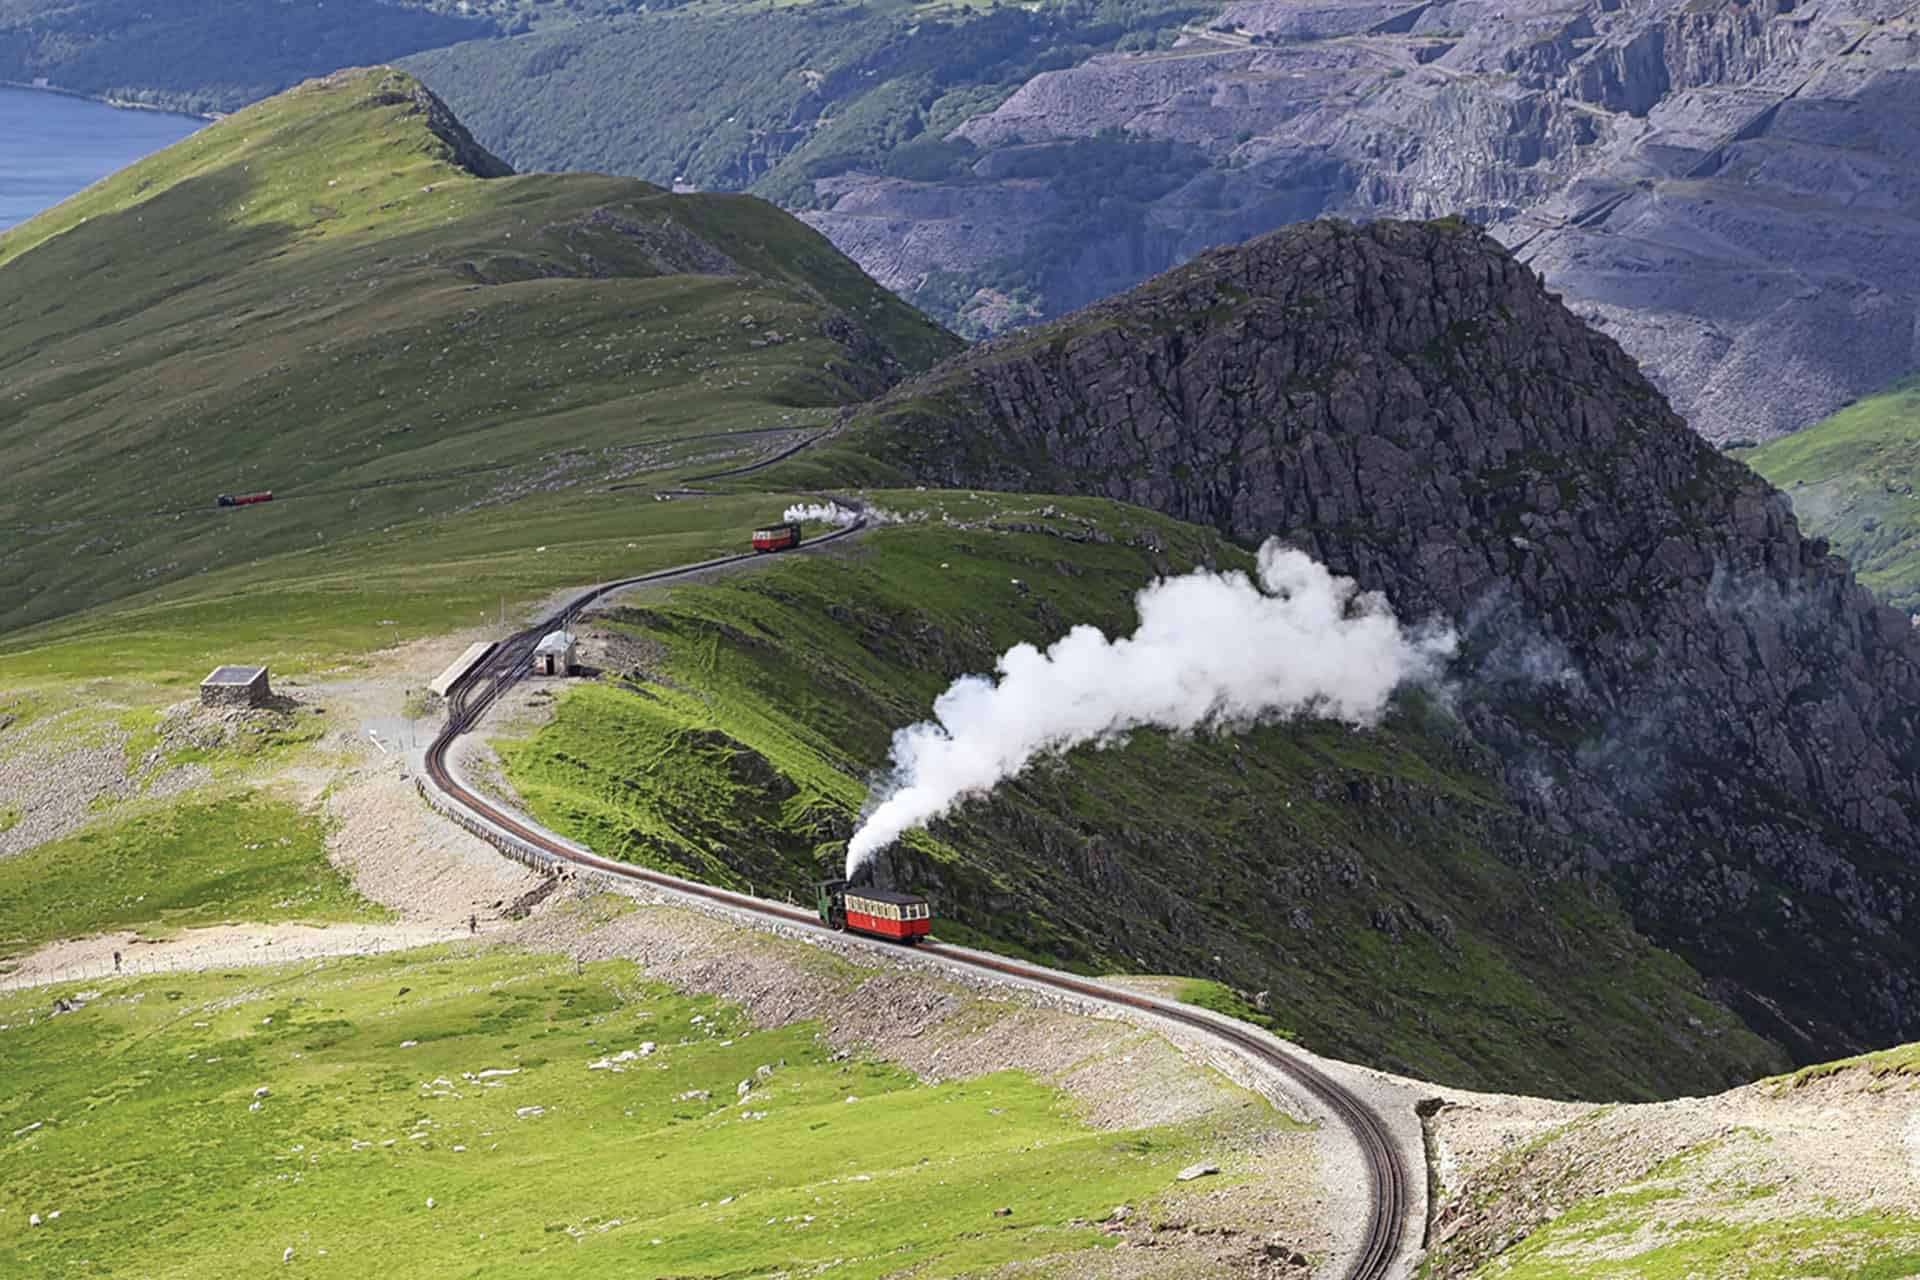 Llanberis_Pass_Mount_Snowdon_Snowdonia_Wales.ls